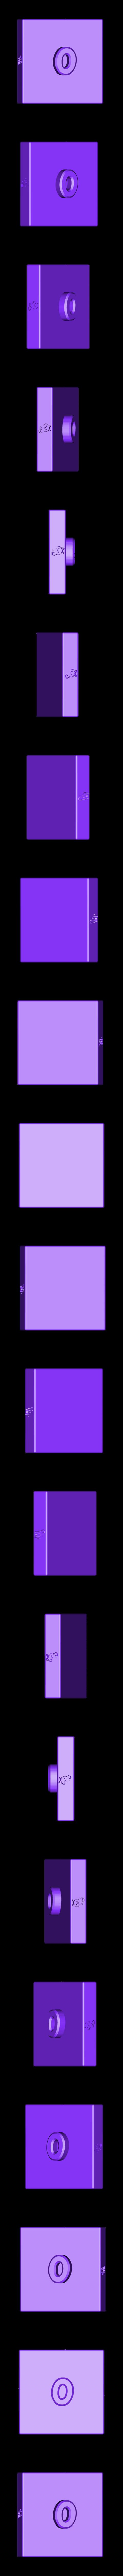 0.stl Download free STL file Mental blocks • Object to 3D print, RevK